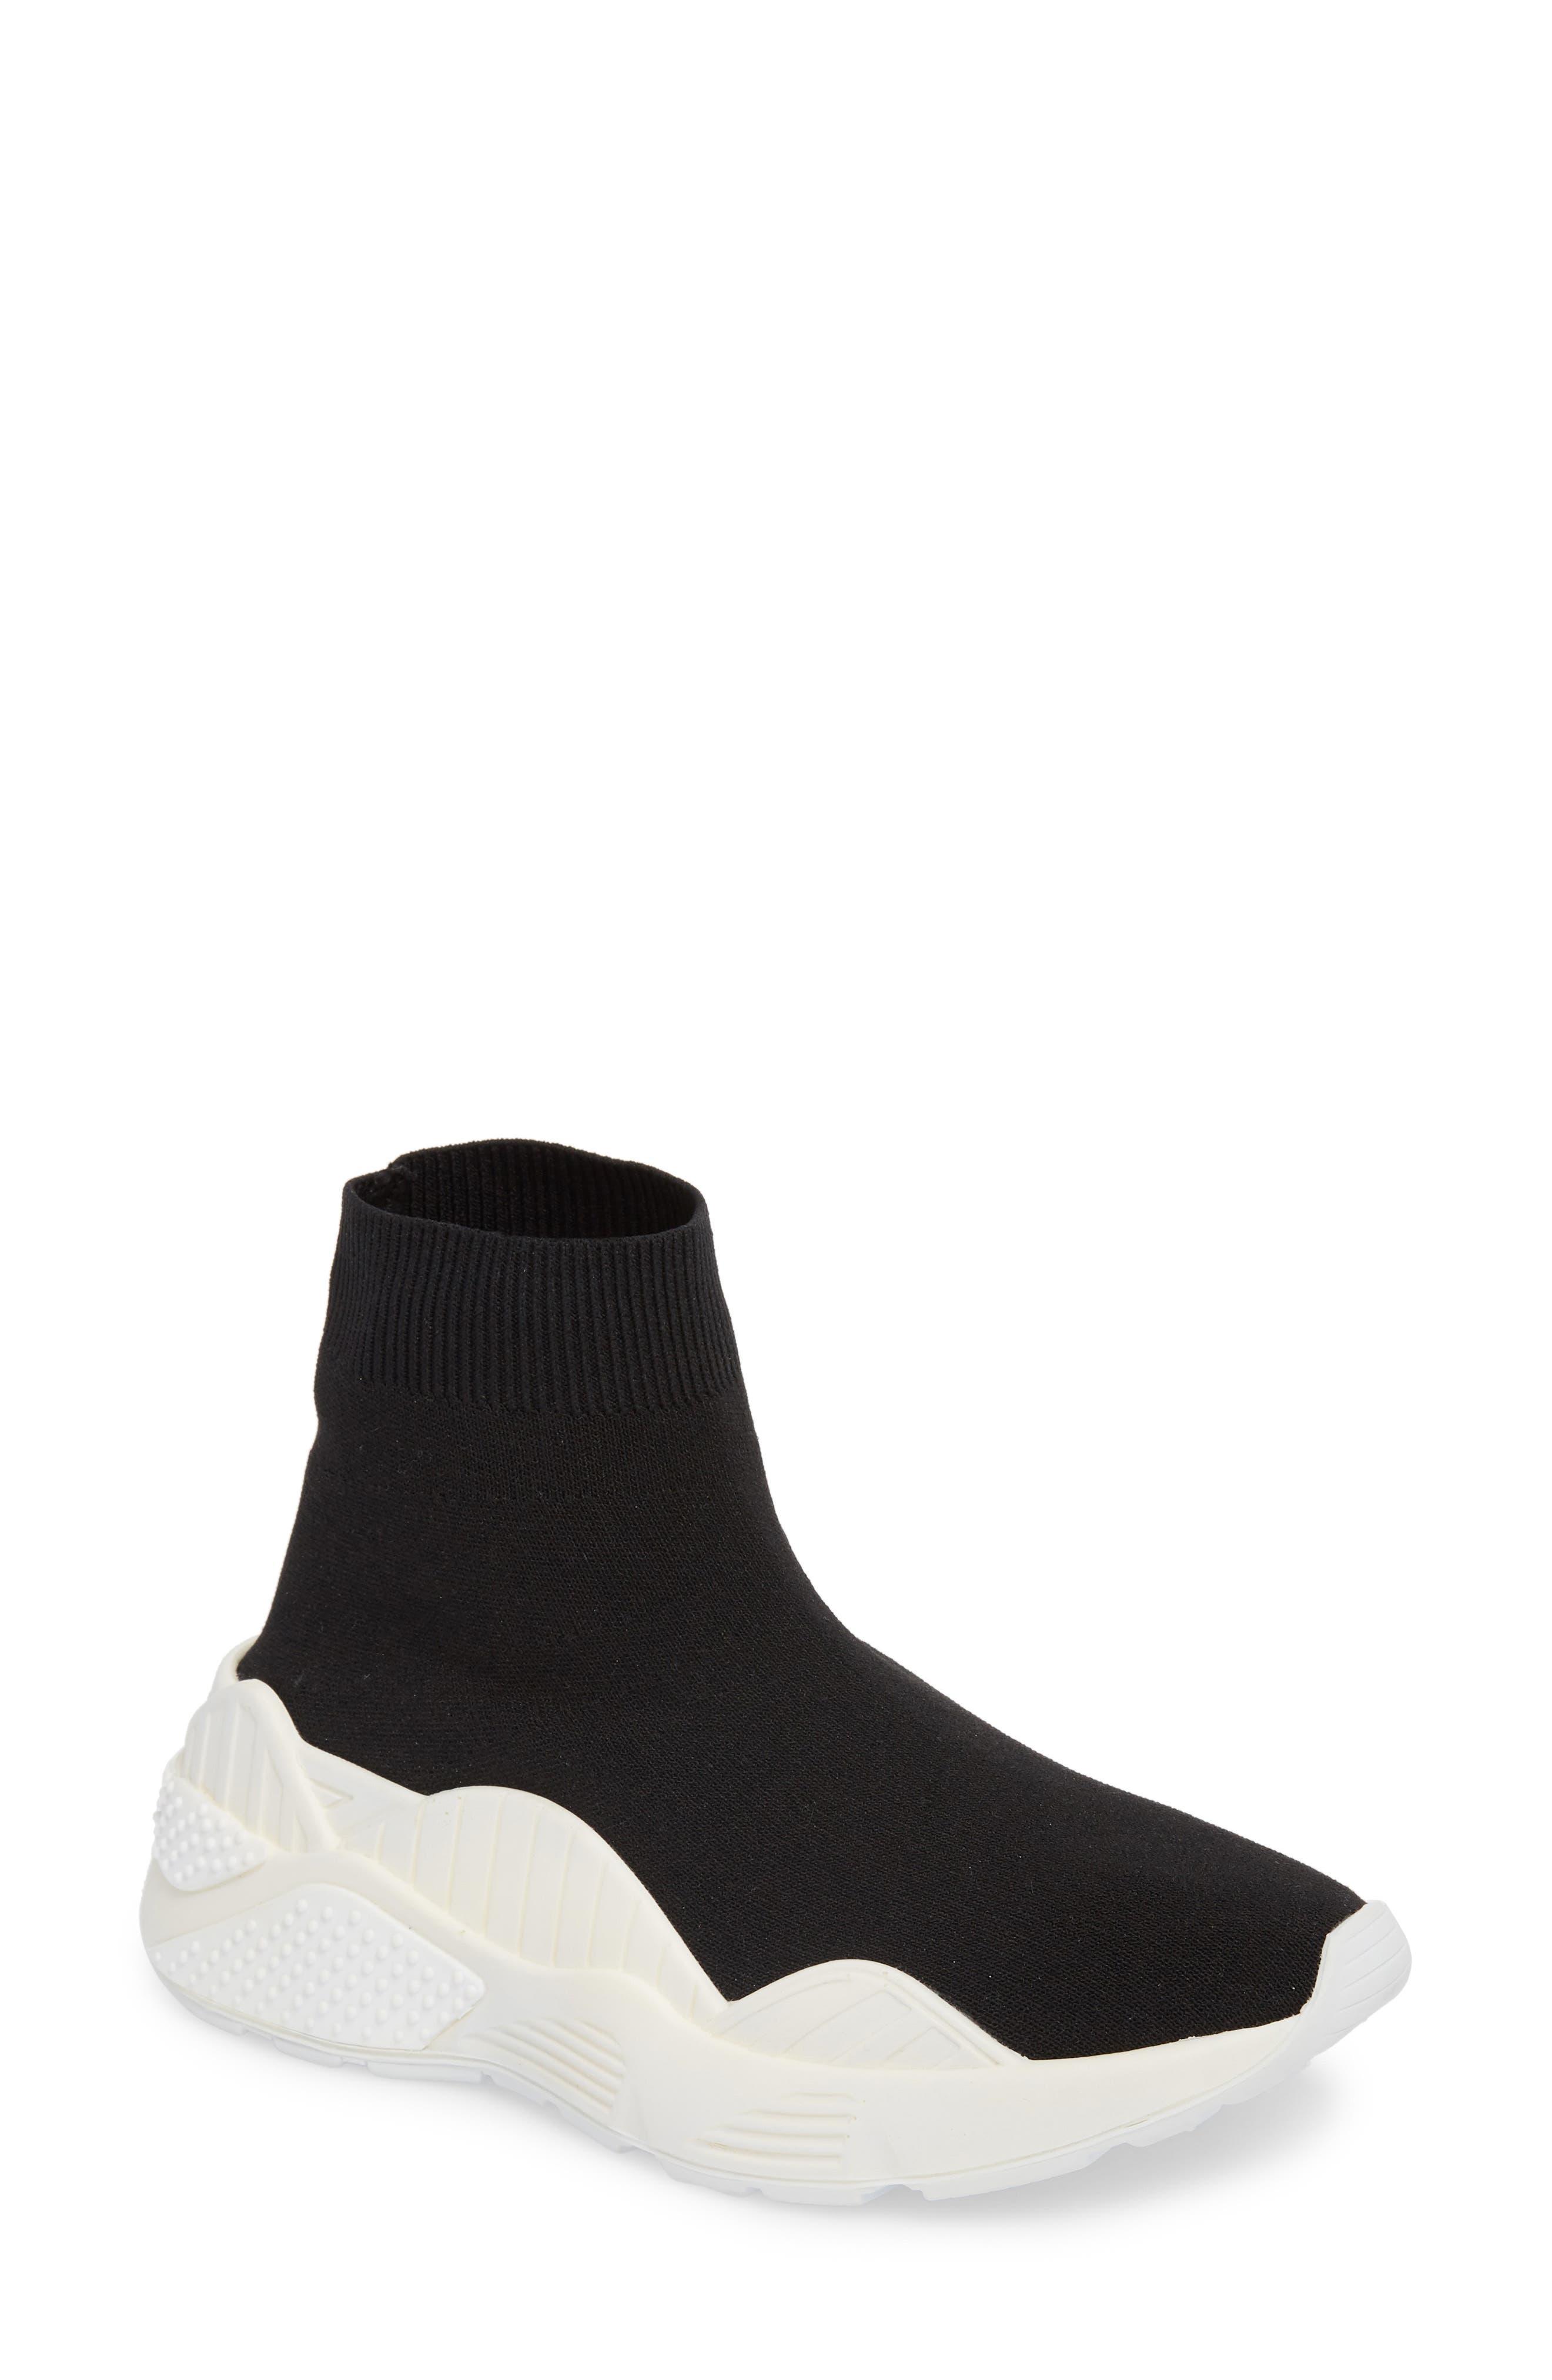 Lunix Sock Sneaker,                             Main thumbnail 1, color,                             Black/ White Leather